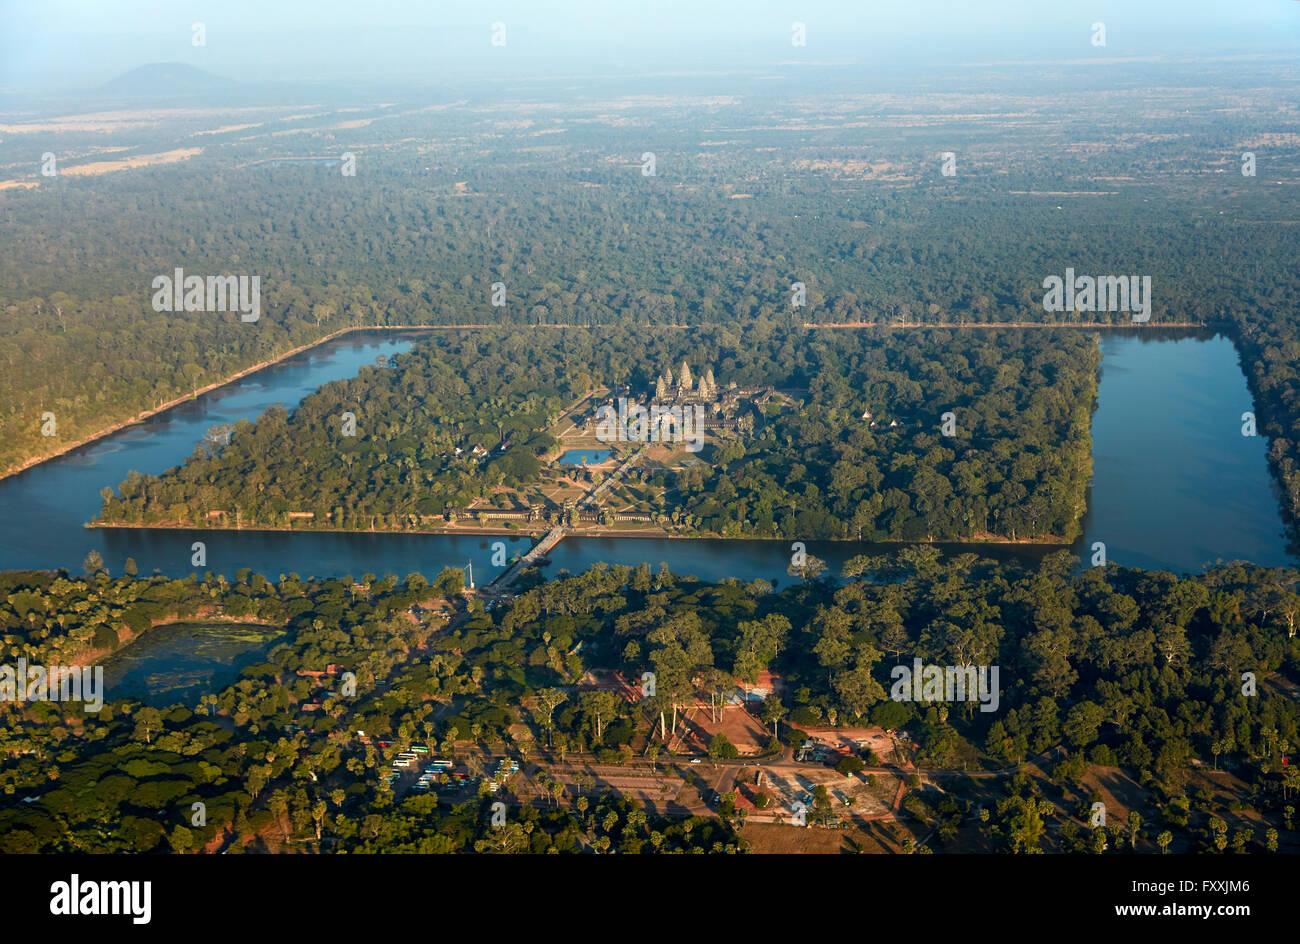 Moat around Angkor Wat, UNESCO World Heritage Site, Siem Reap, Cambodia - aerial - Stock Image